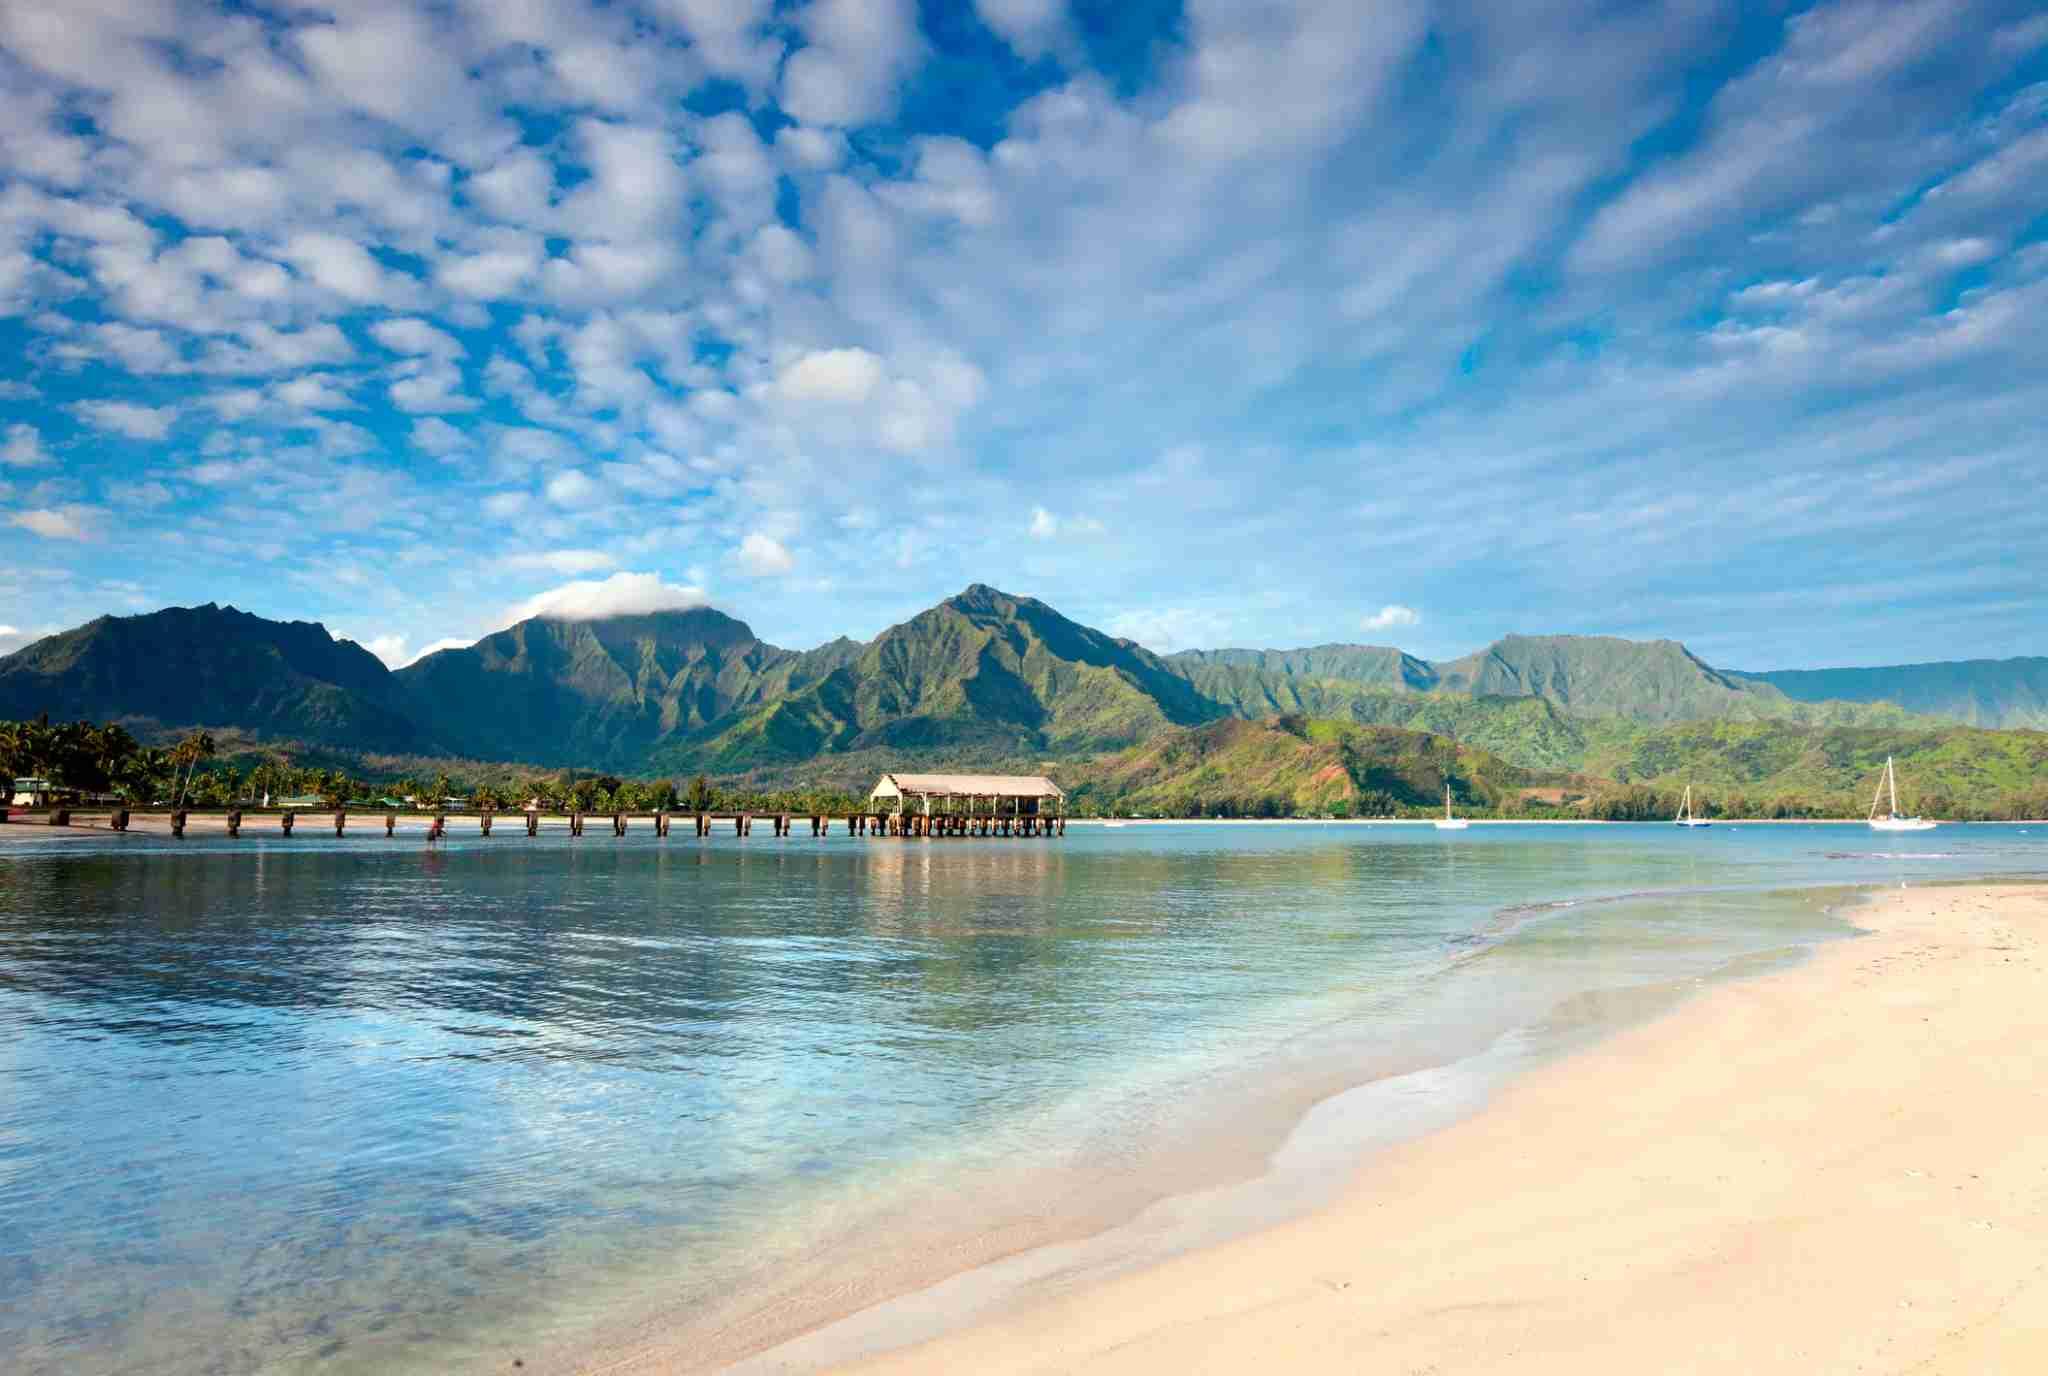 World famous Hanalei Bay seascape scenic beach in Hanalei, Kauai, Hawaii.